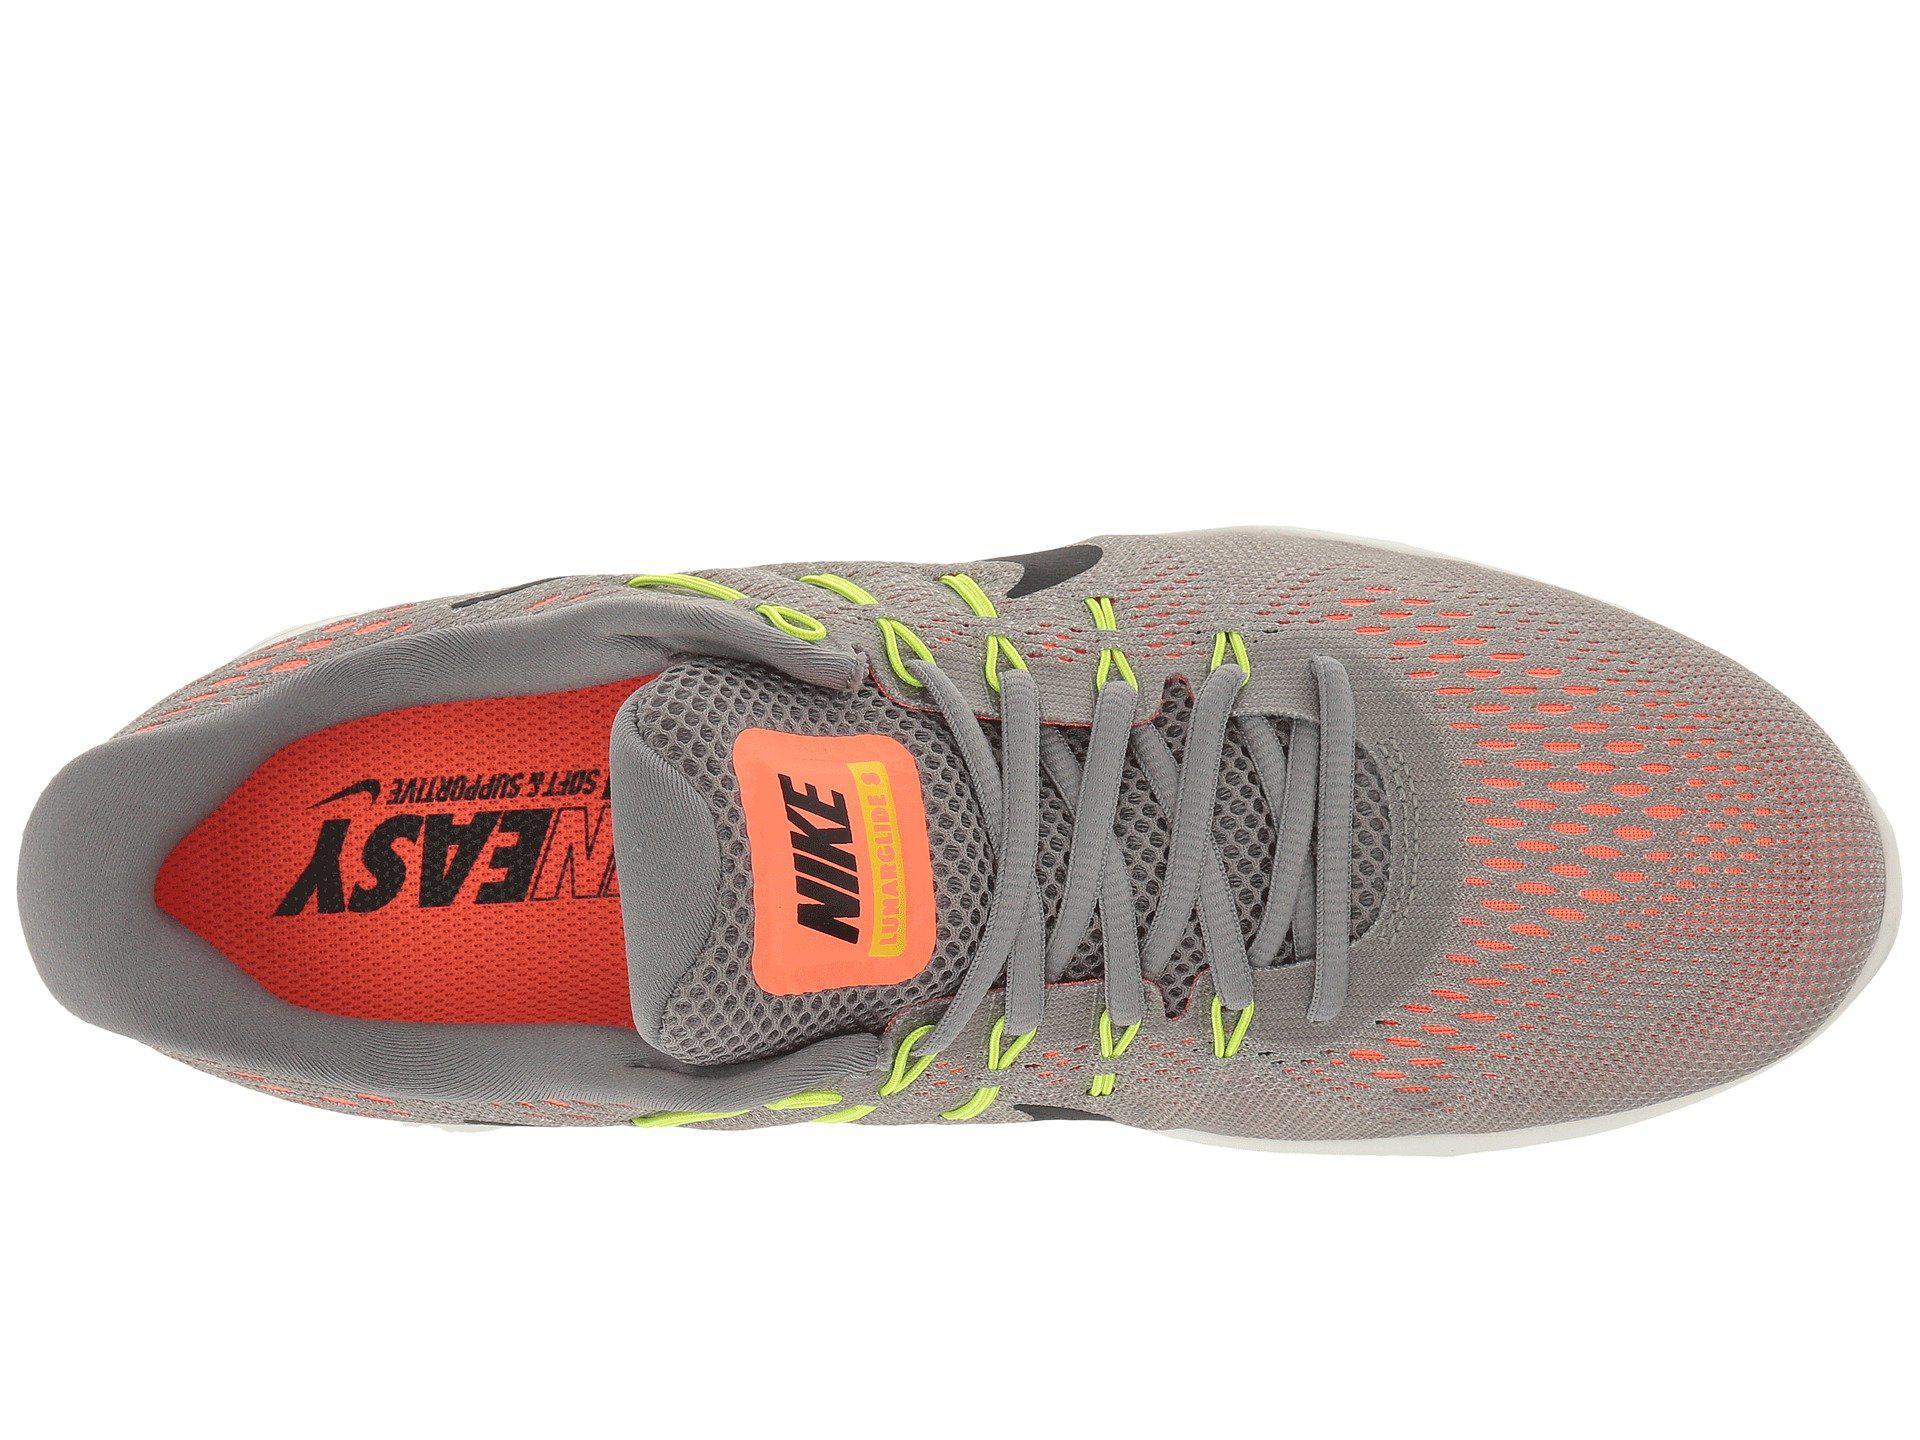 03d8e6c4486b Nike - Multicolor Lunarglide 8 for Men - Lyst. View fullscreen